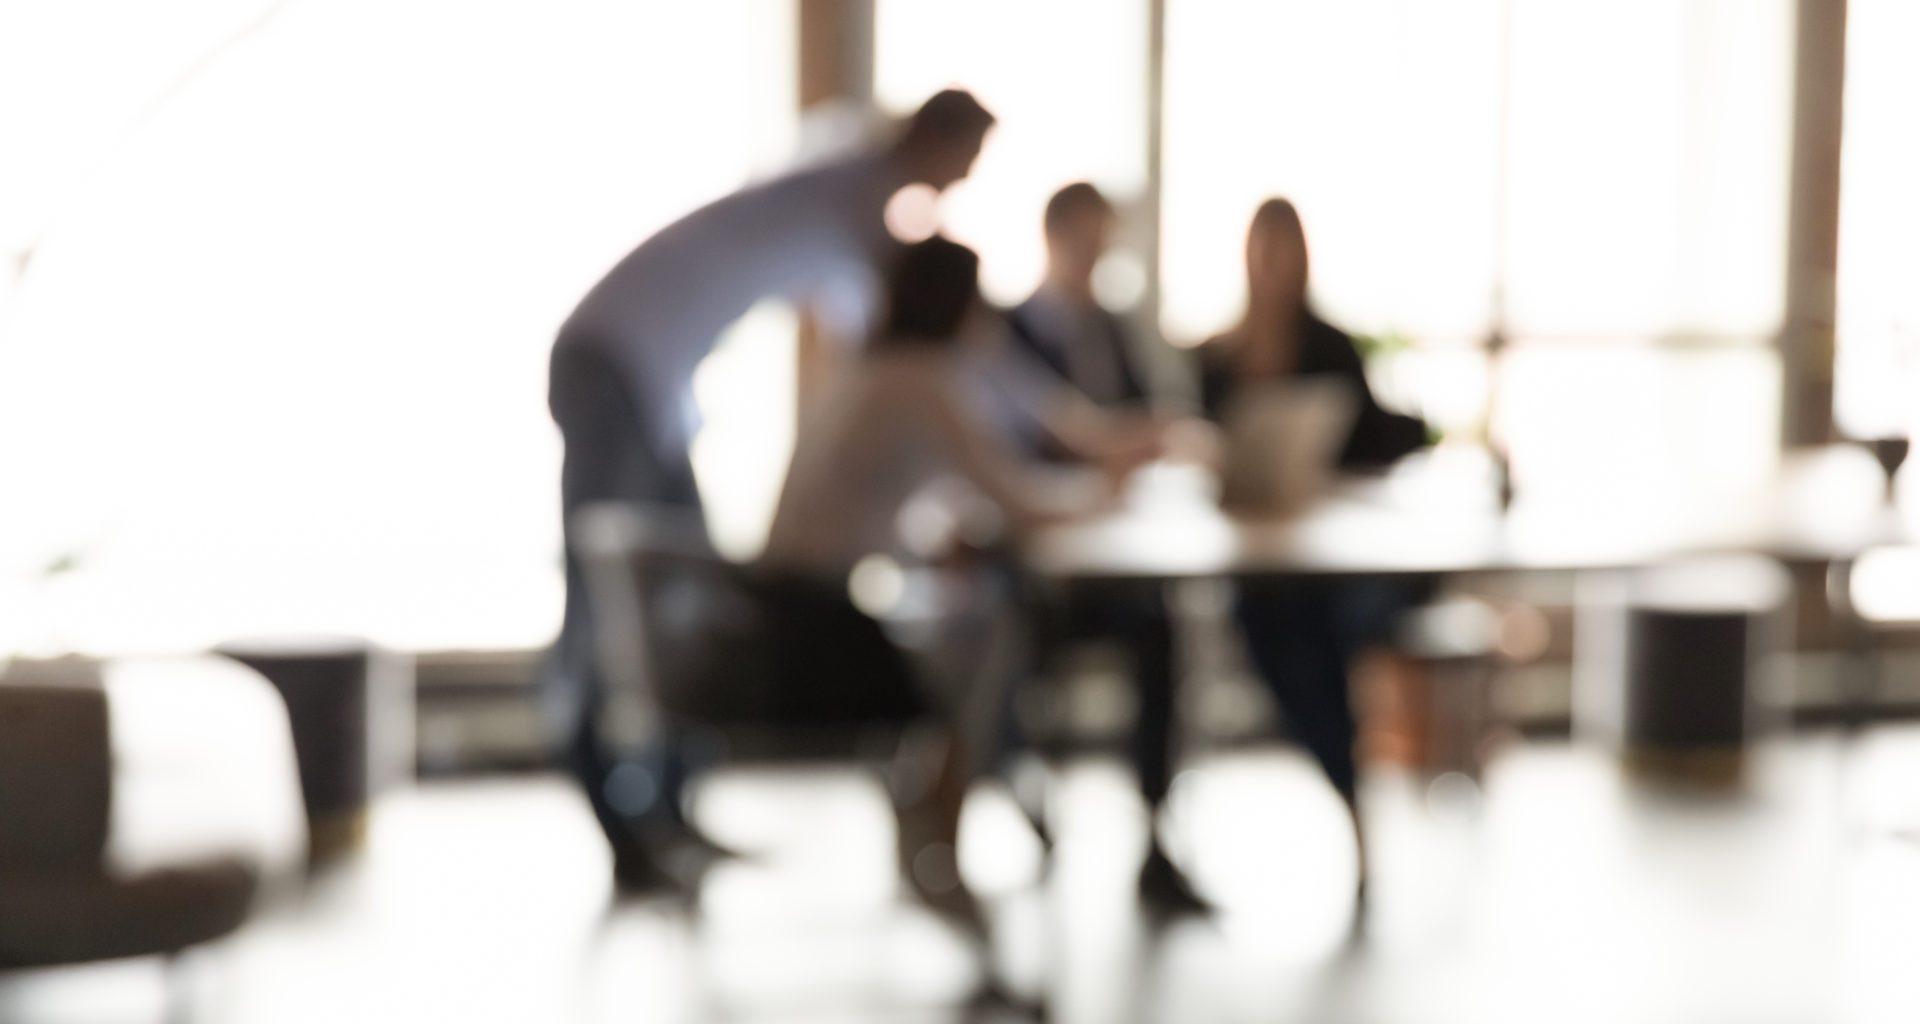 Scotland's public boards still failing on gender equality 8